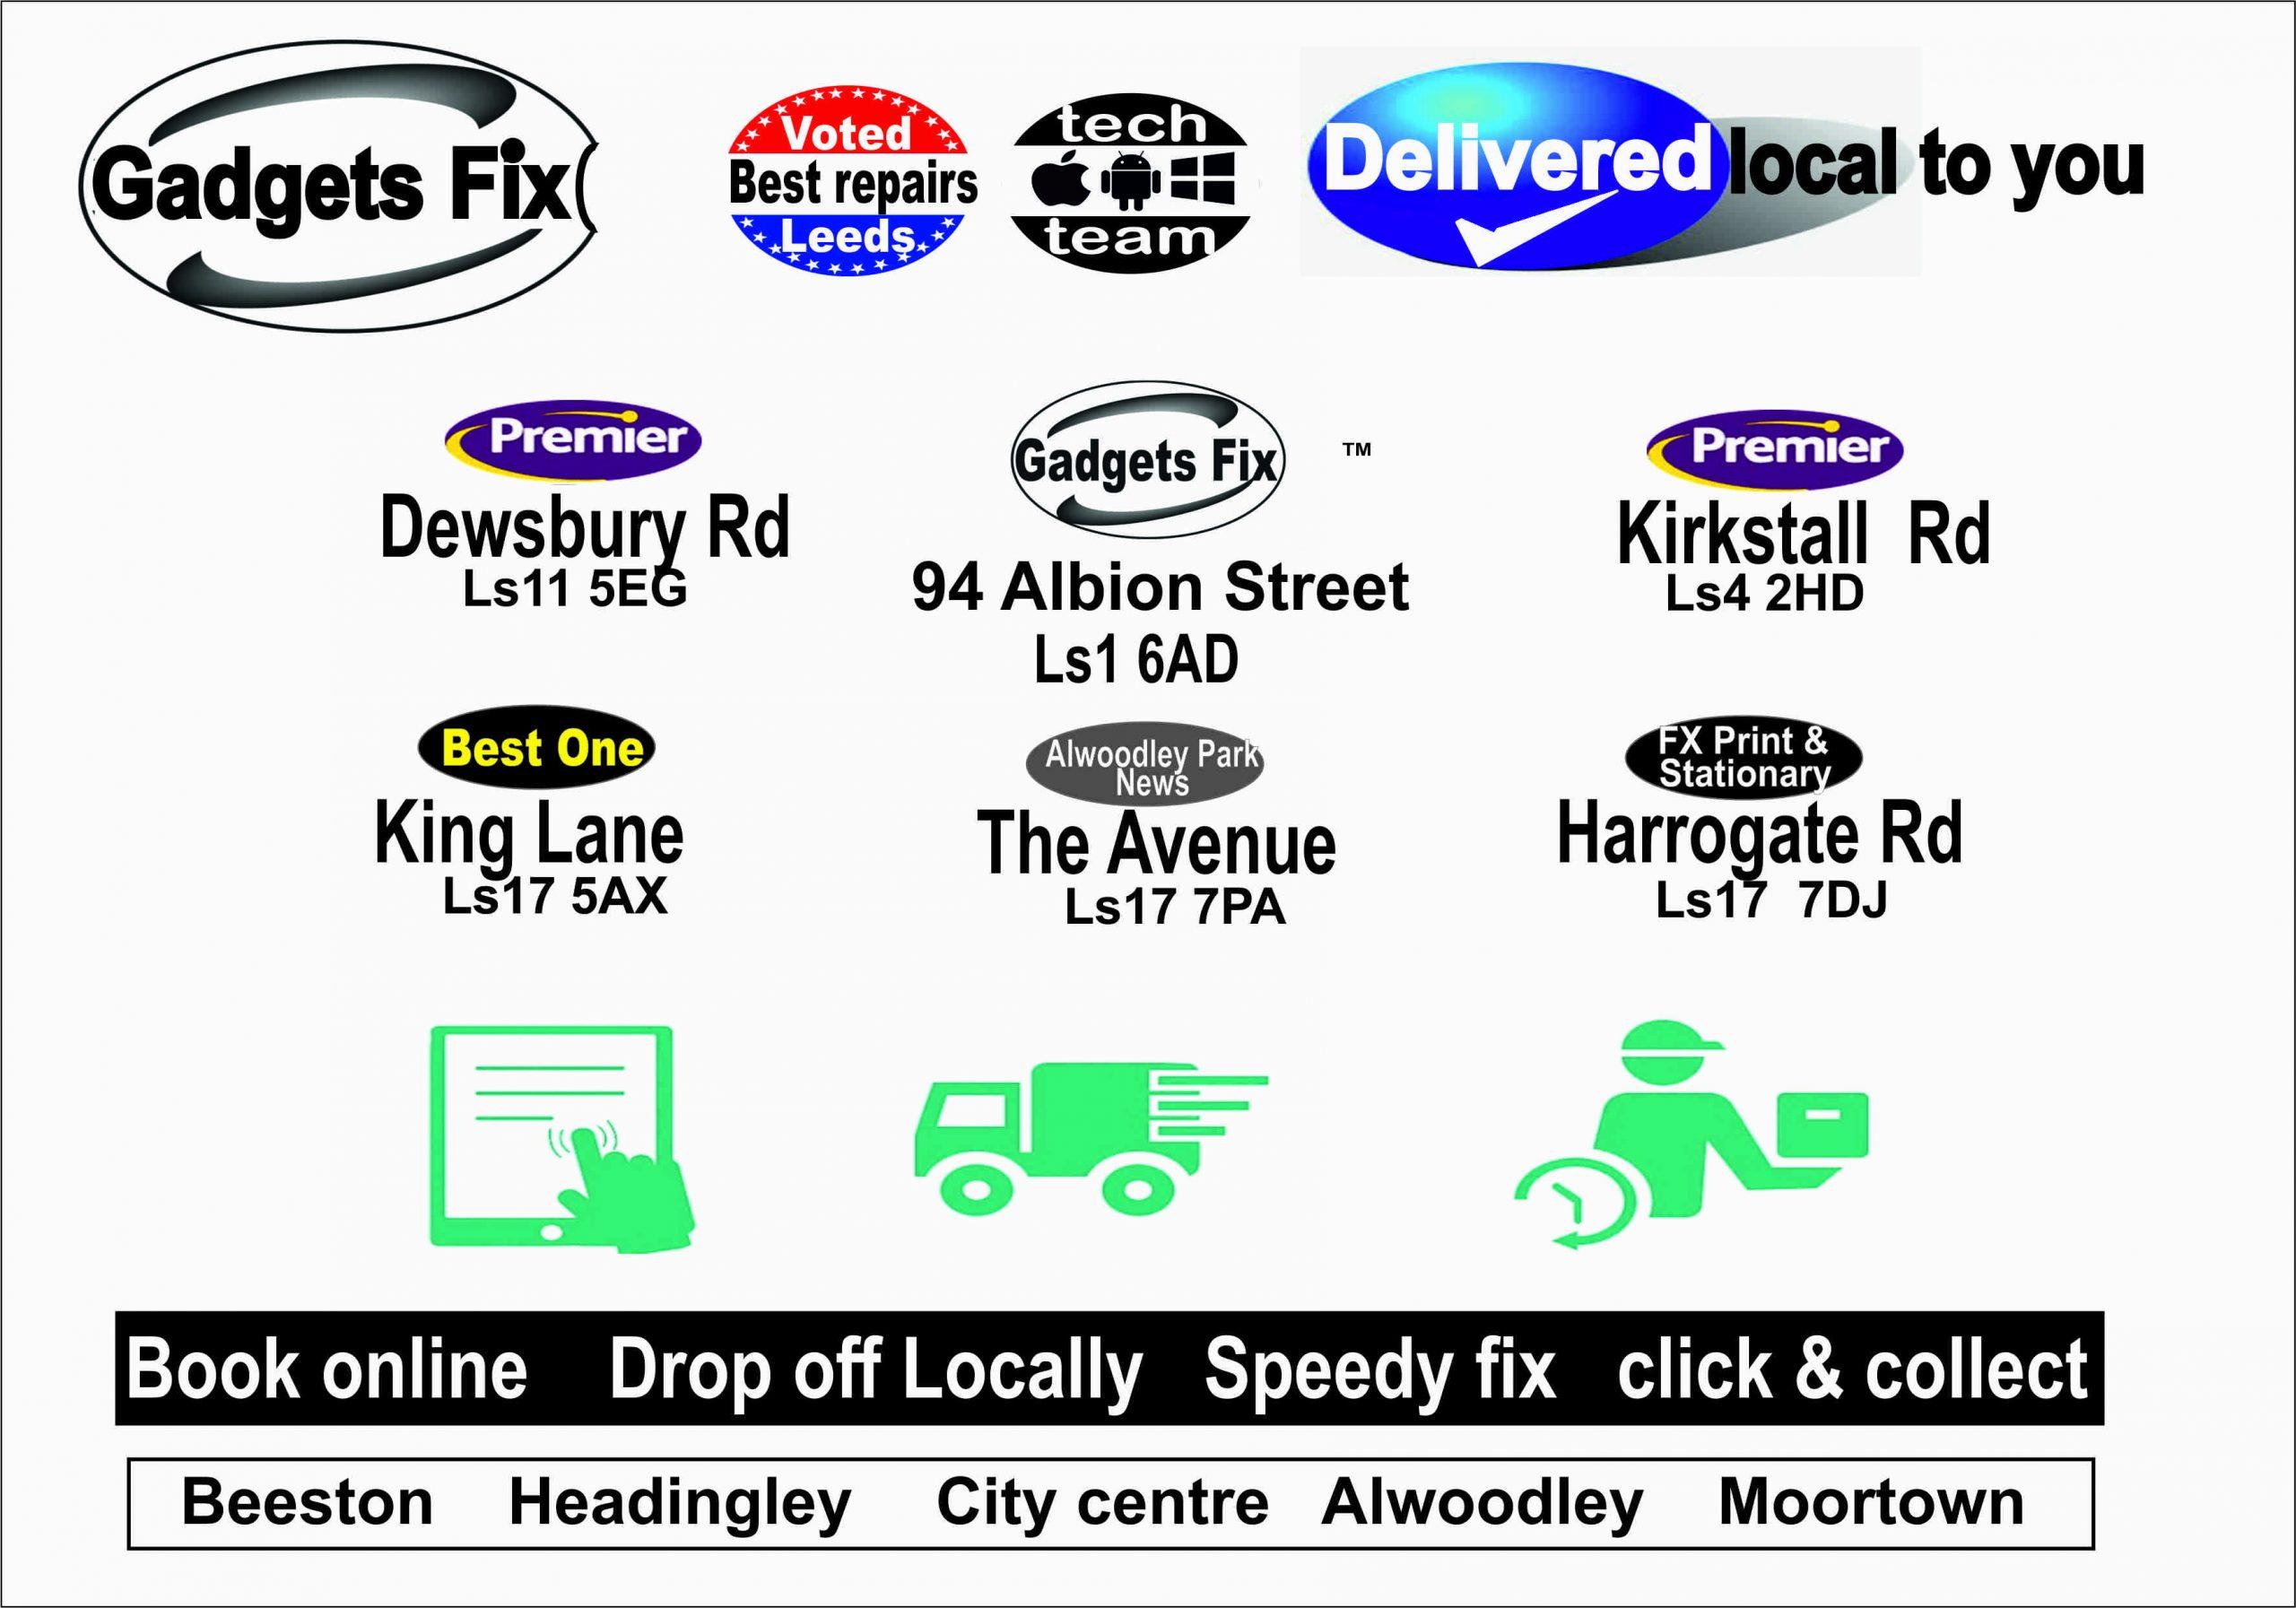 Gadgets fix locations gadgets fix leeds city centre Allwoodley, beeston, Moortown , Headingley Repair and sell iPhones, smart phones, macbooks, ipads, tablets, iPatch, ismash, samsung , Apple store, CEX